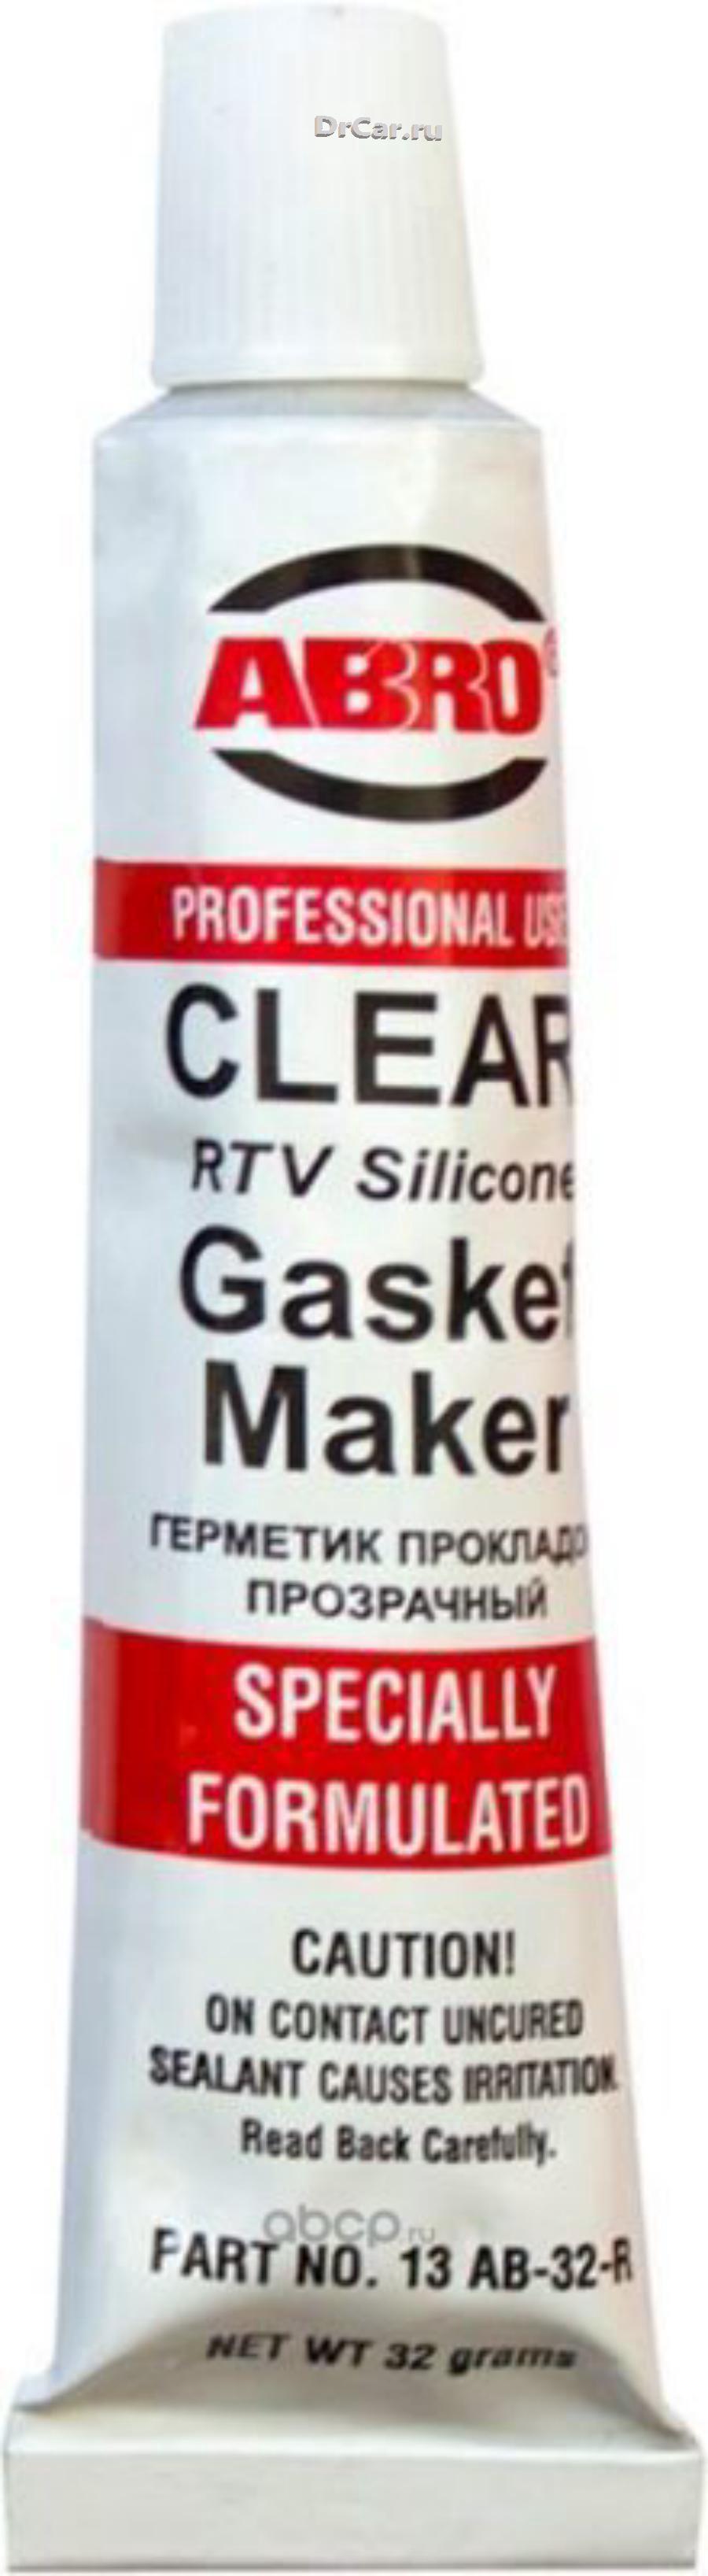 Герметик силиконовый прозрачный 32 г ABRO 13-AB-CH-32R ABRO 13ABCH32R